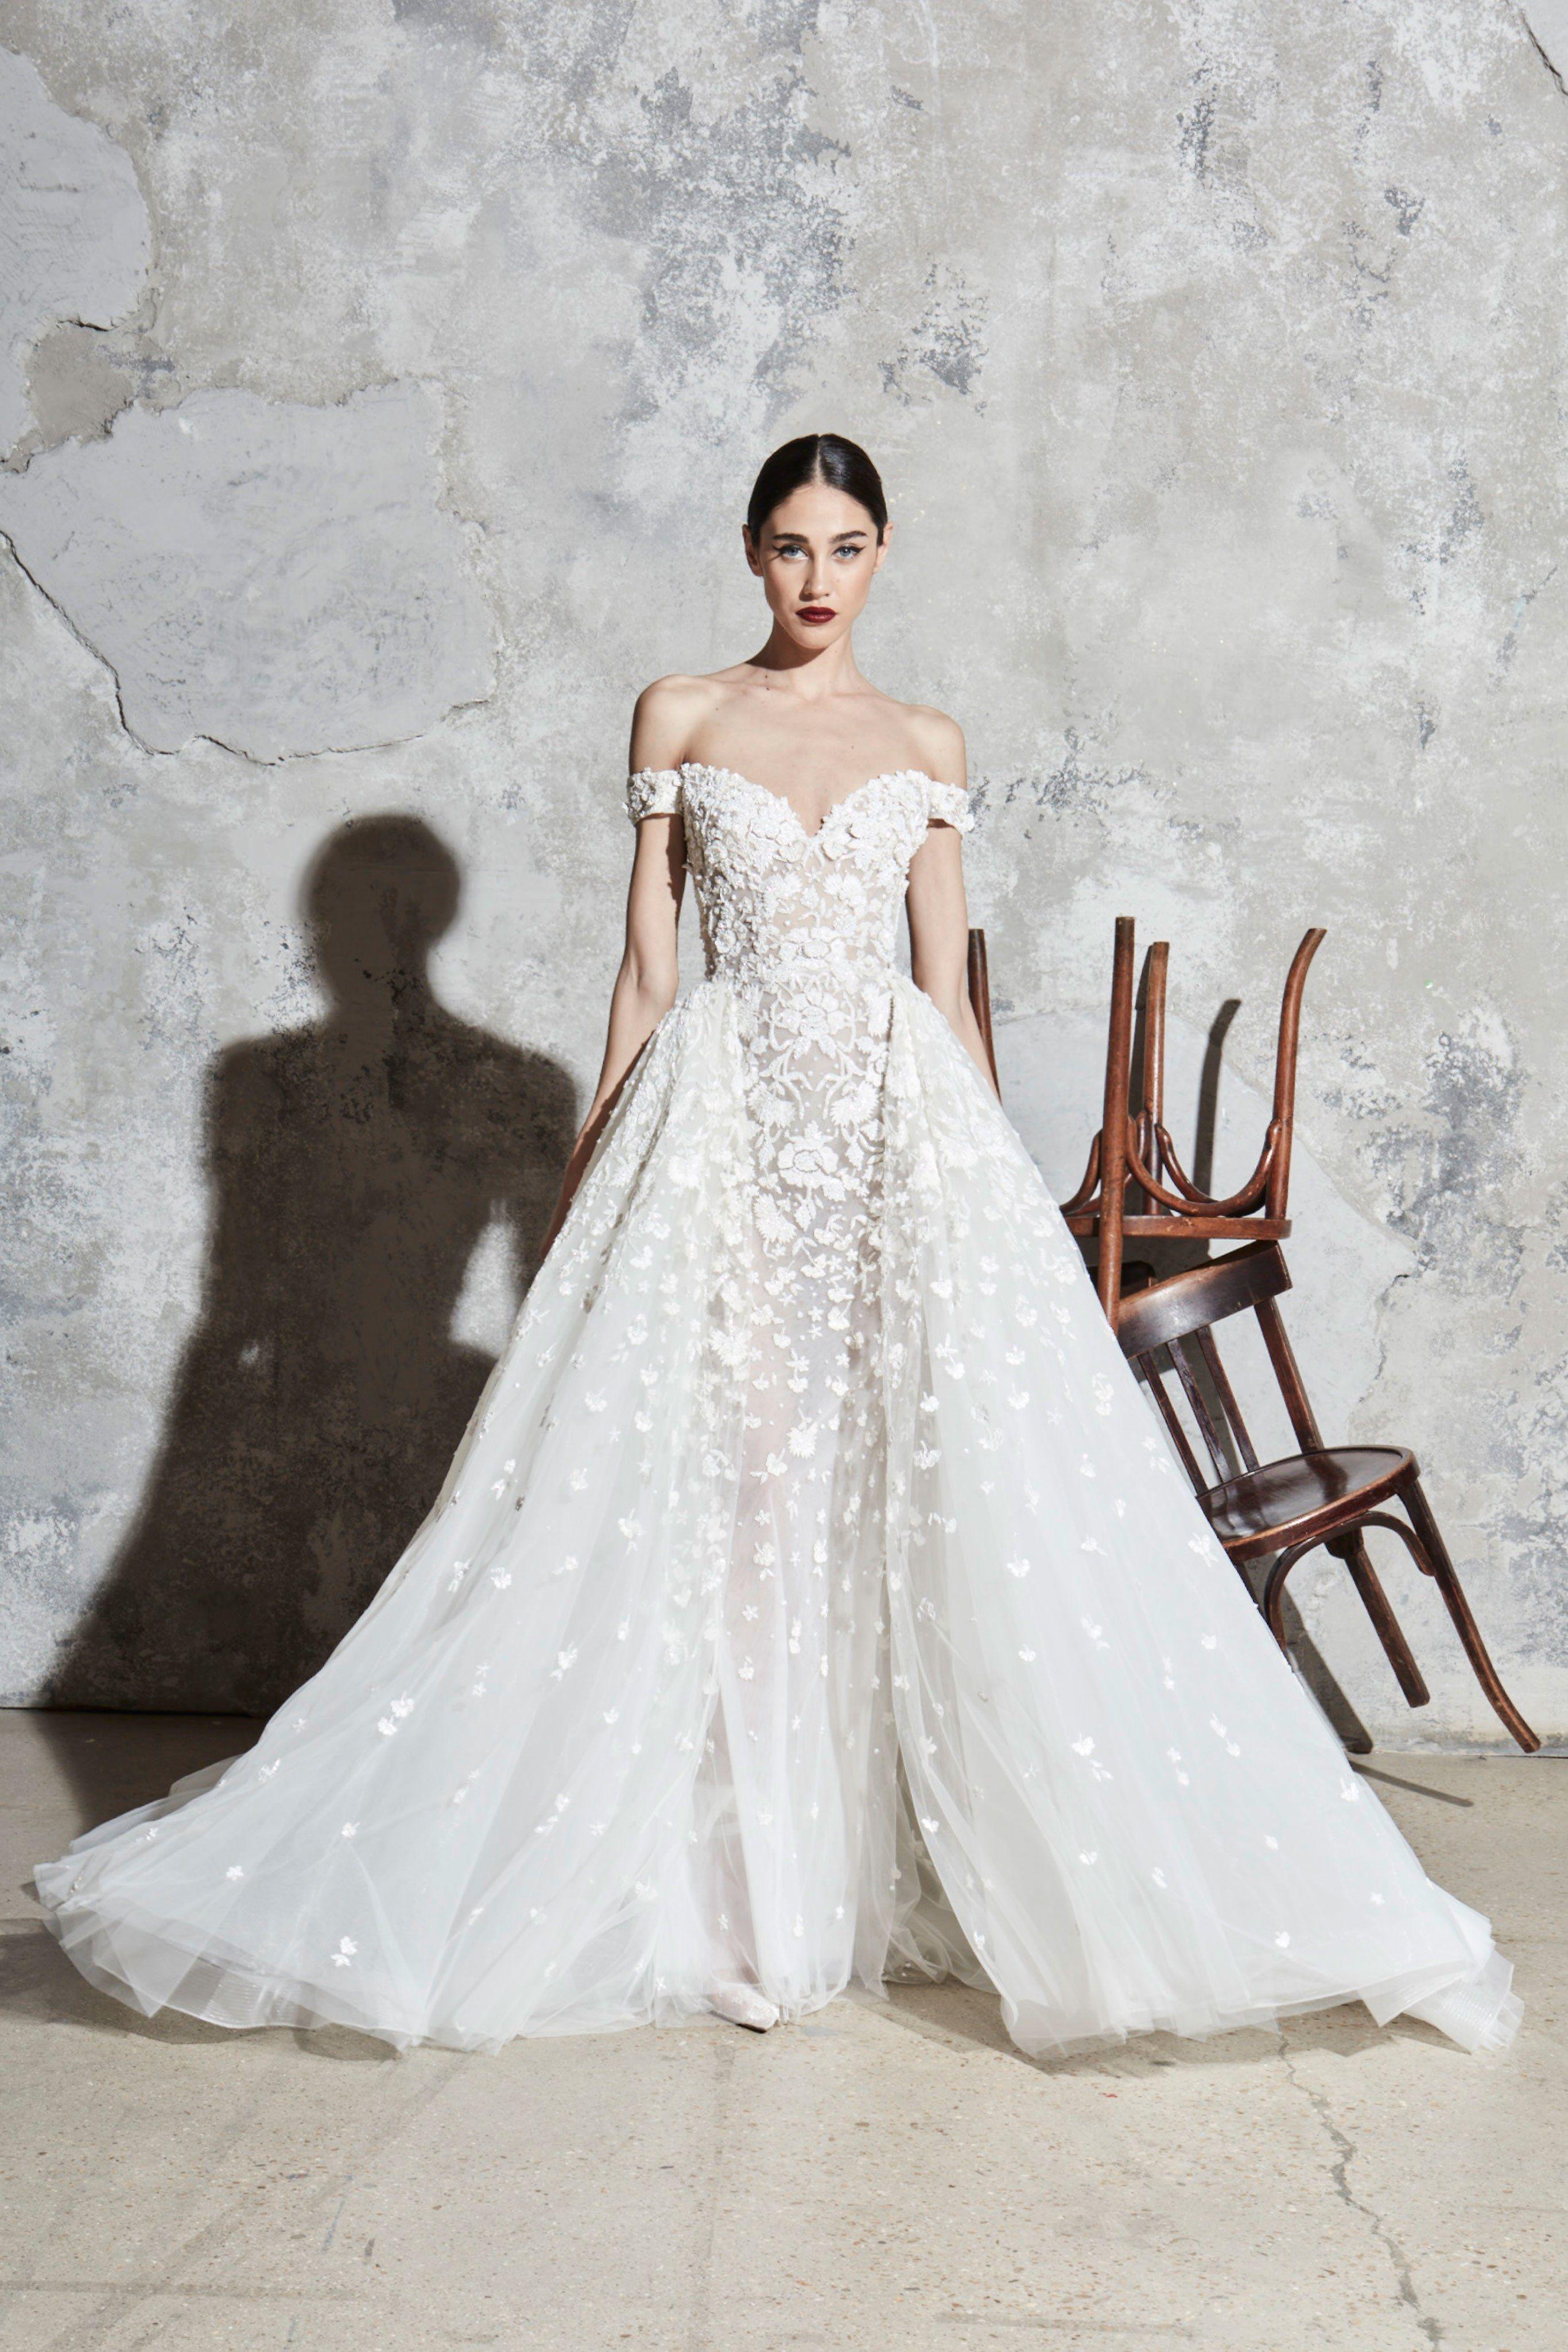 Zuhair Murad Bridal Spring 2020 Fashion Show Zuhair Murad Bridal Bridal Dresses Black Lace Bridesmaid Dress